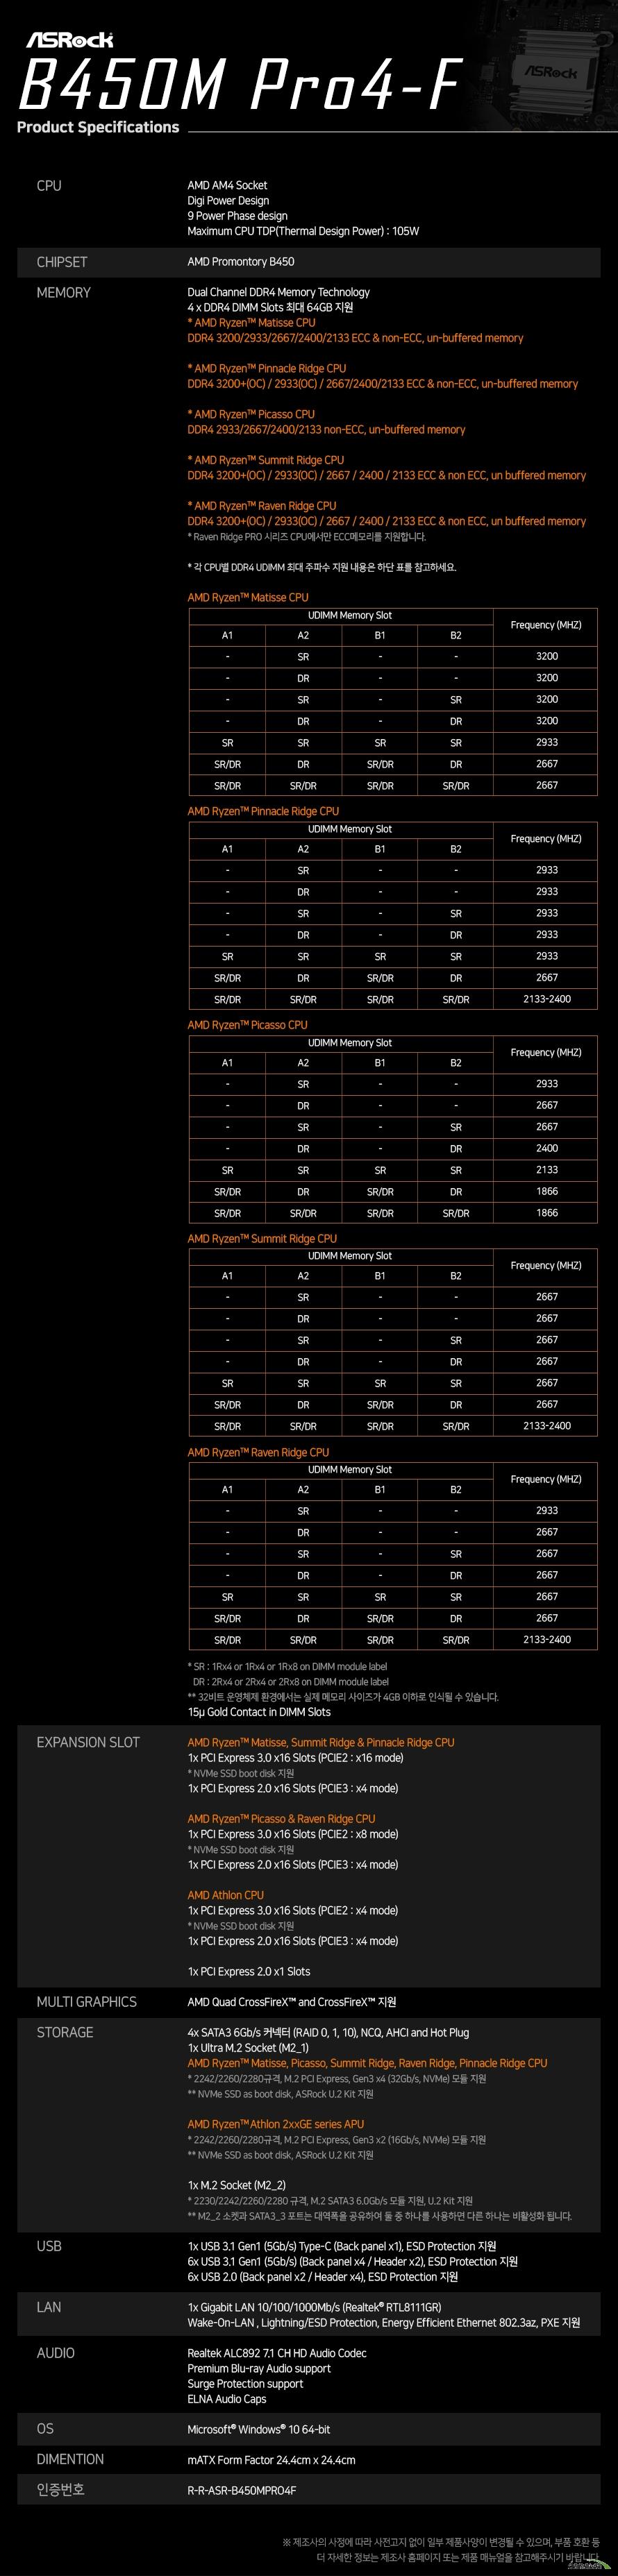 ASRock B450M PRO4-F 에즈윈